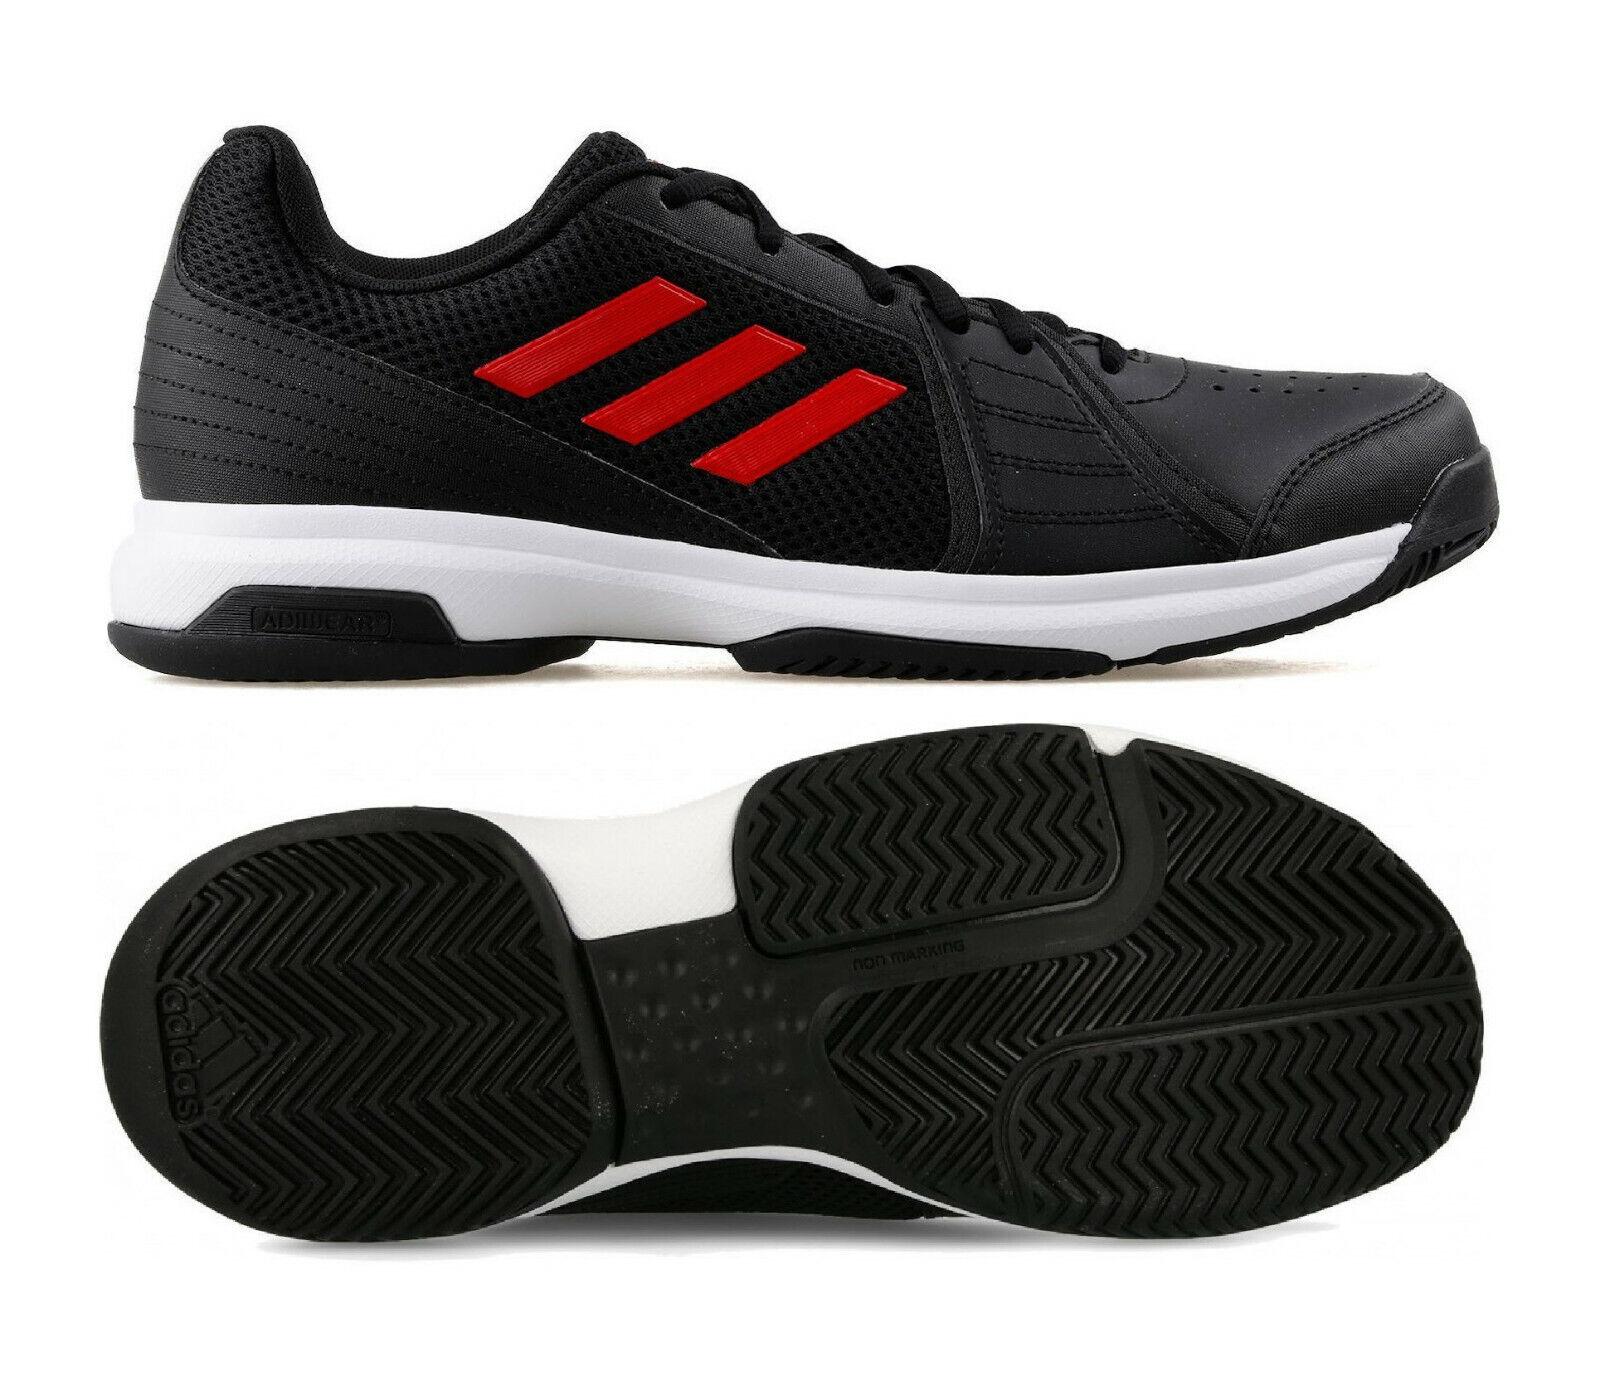 Adidas Para Hombre Zapatillas Adidas enfoque Tribunal Zapatillas Tenis Zapatillas Para Hombre Al Aire Libre